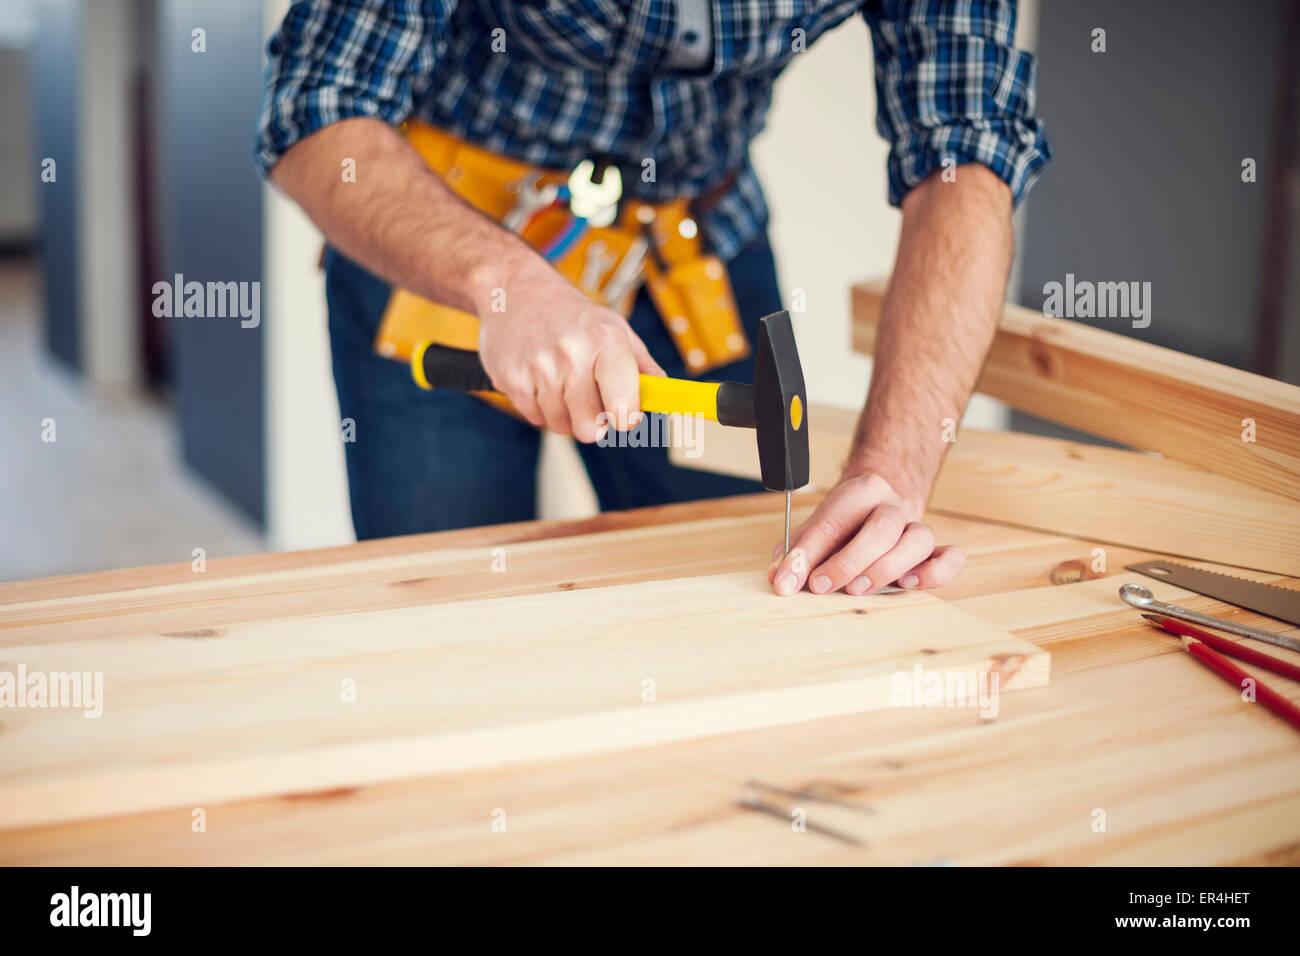 Close up of man hitting nail by hammer. Pilzno, Poland - Stock Image